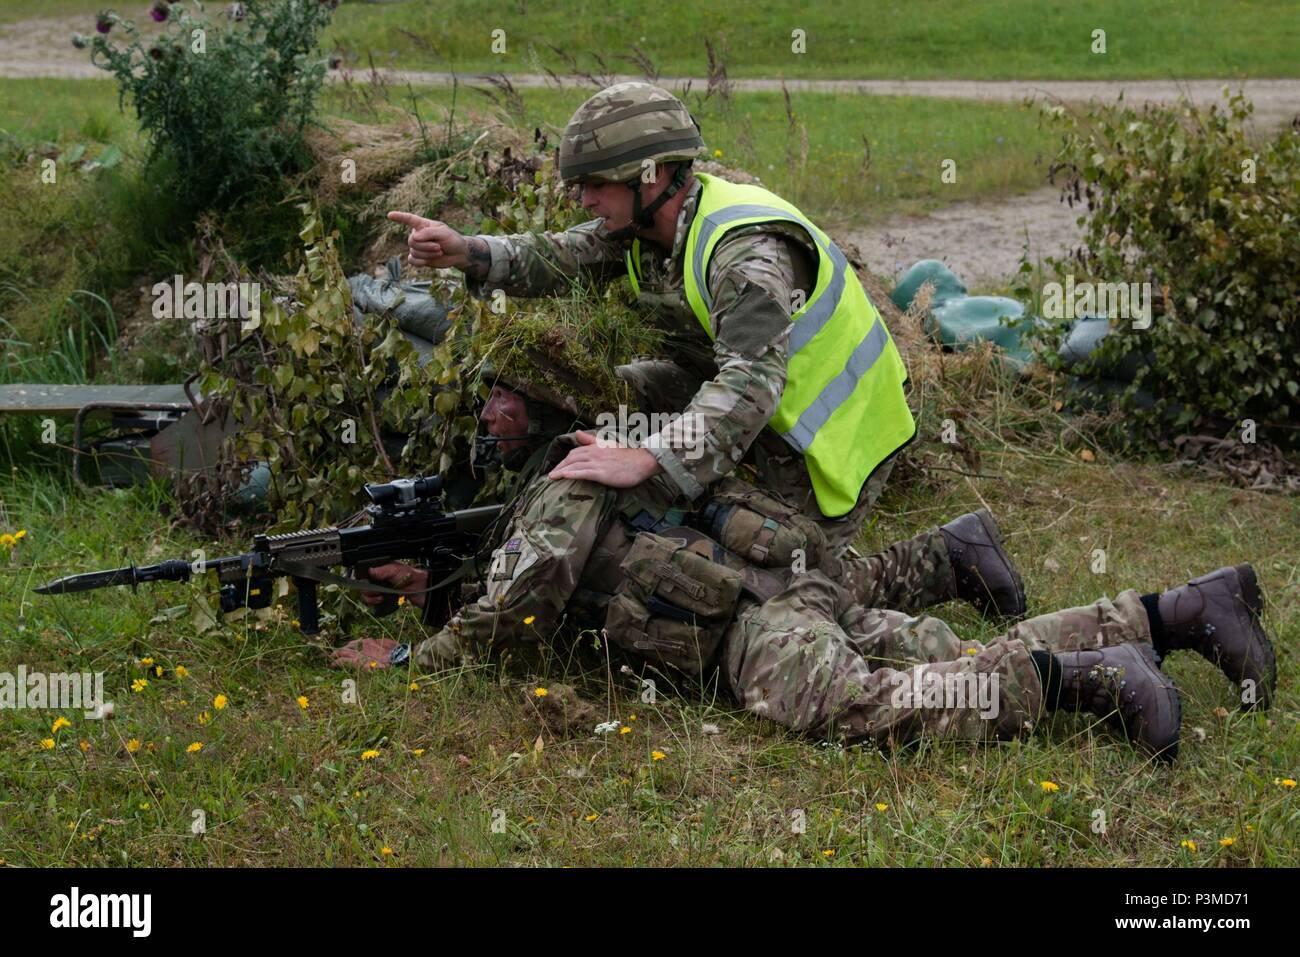 Atc Cadets Stock Photos & Atc Cadets Stock Images - Alamy